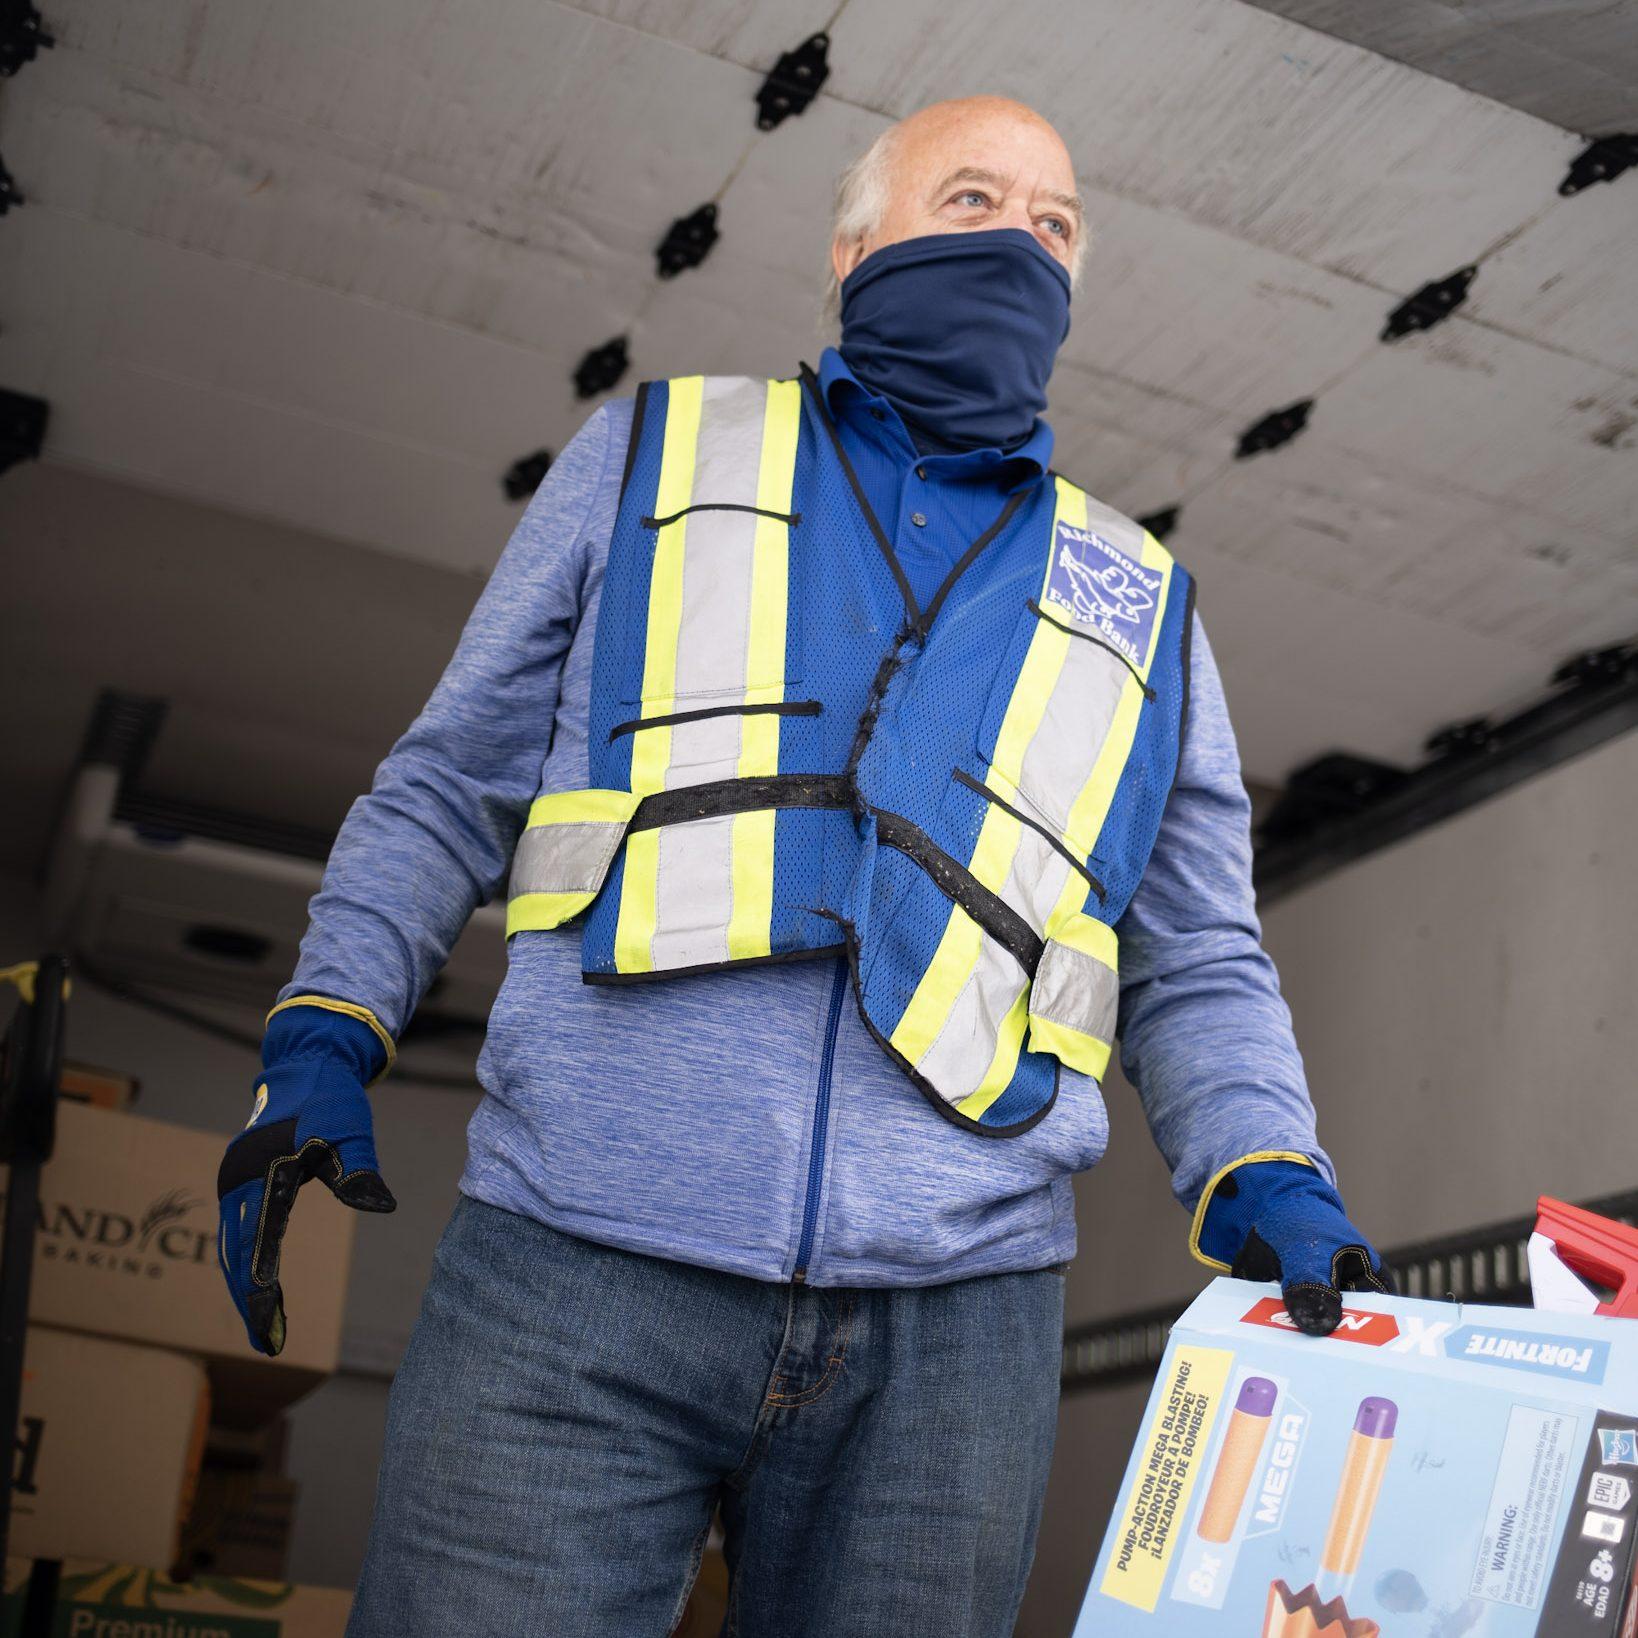 food bank volunteer driver unloads donations from truck